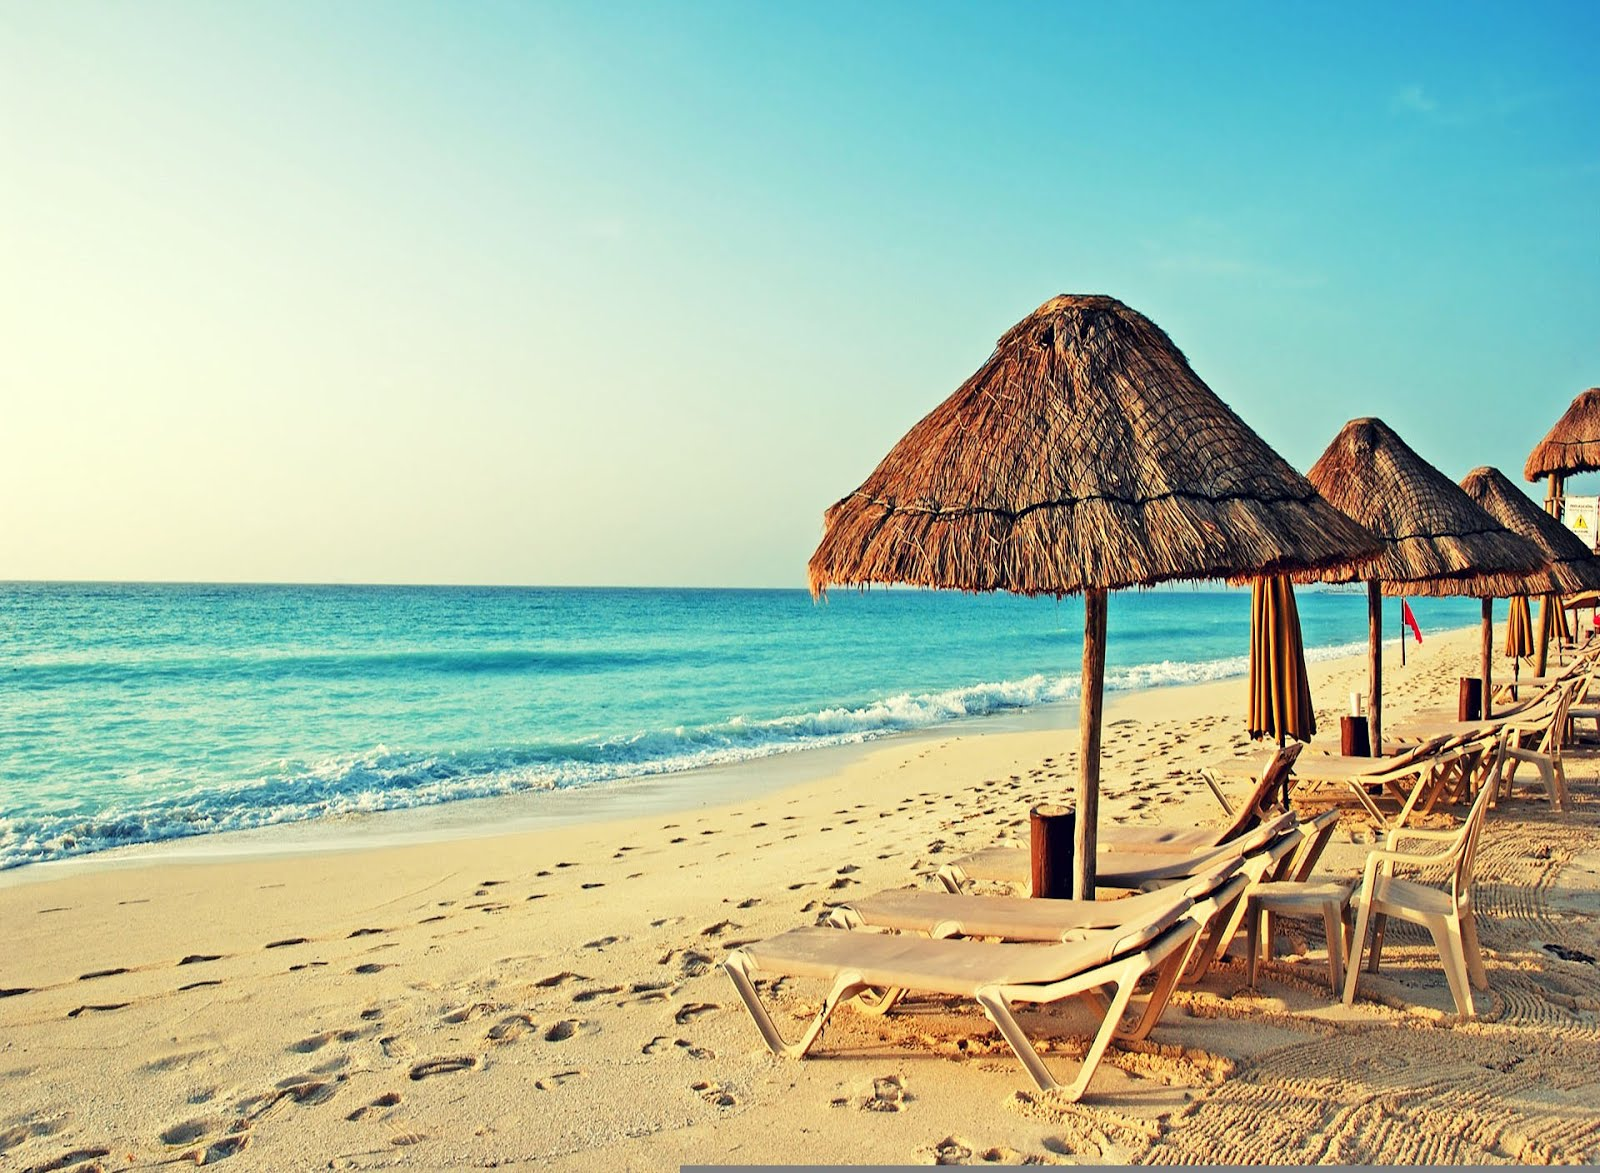 http://2.bp.blogspot.com/-wJQdHcfUTRM/UIpCe3JmQ-I/AAAAAAAAKC8/AXWJAyHB5Hg/s1600/beach_tablet.jpg